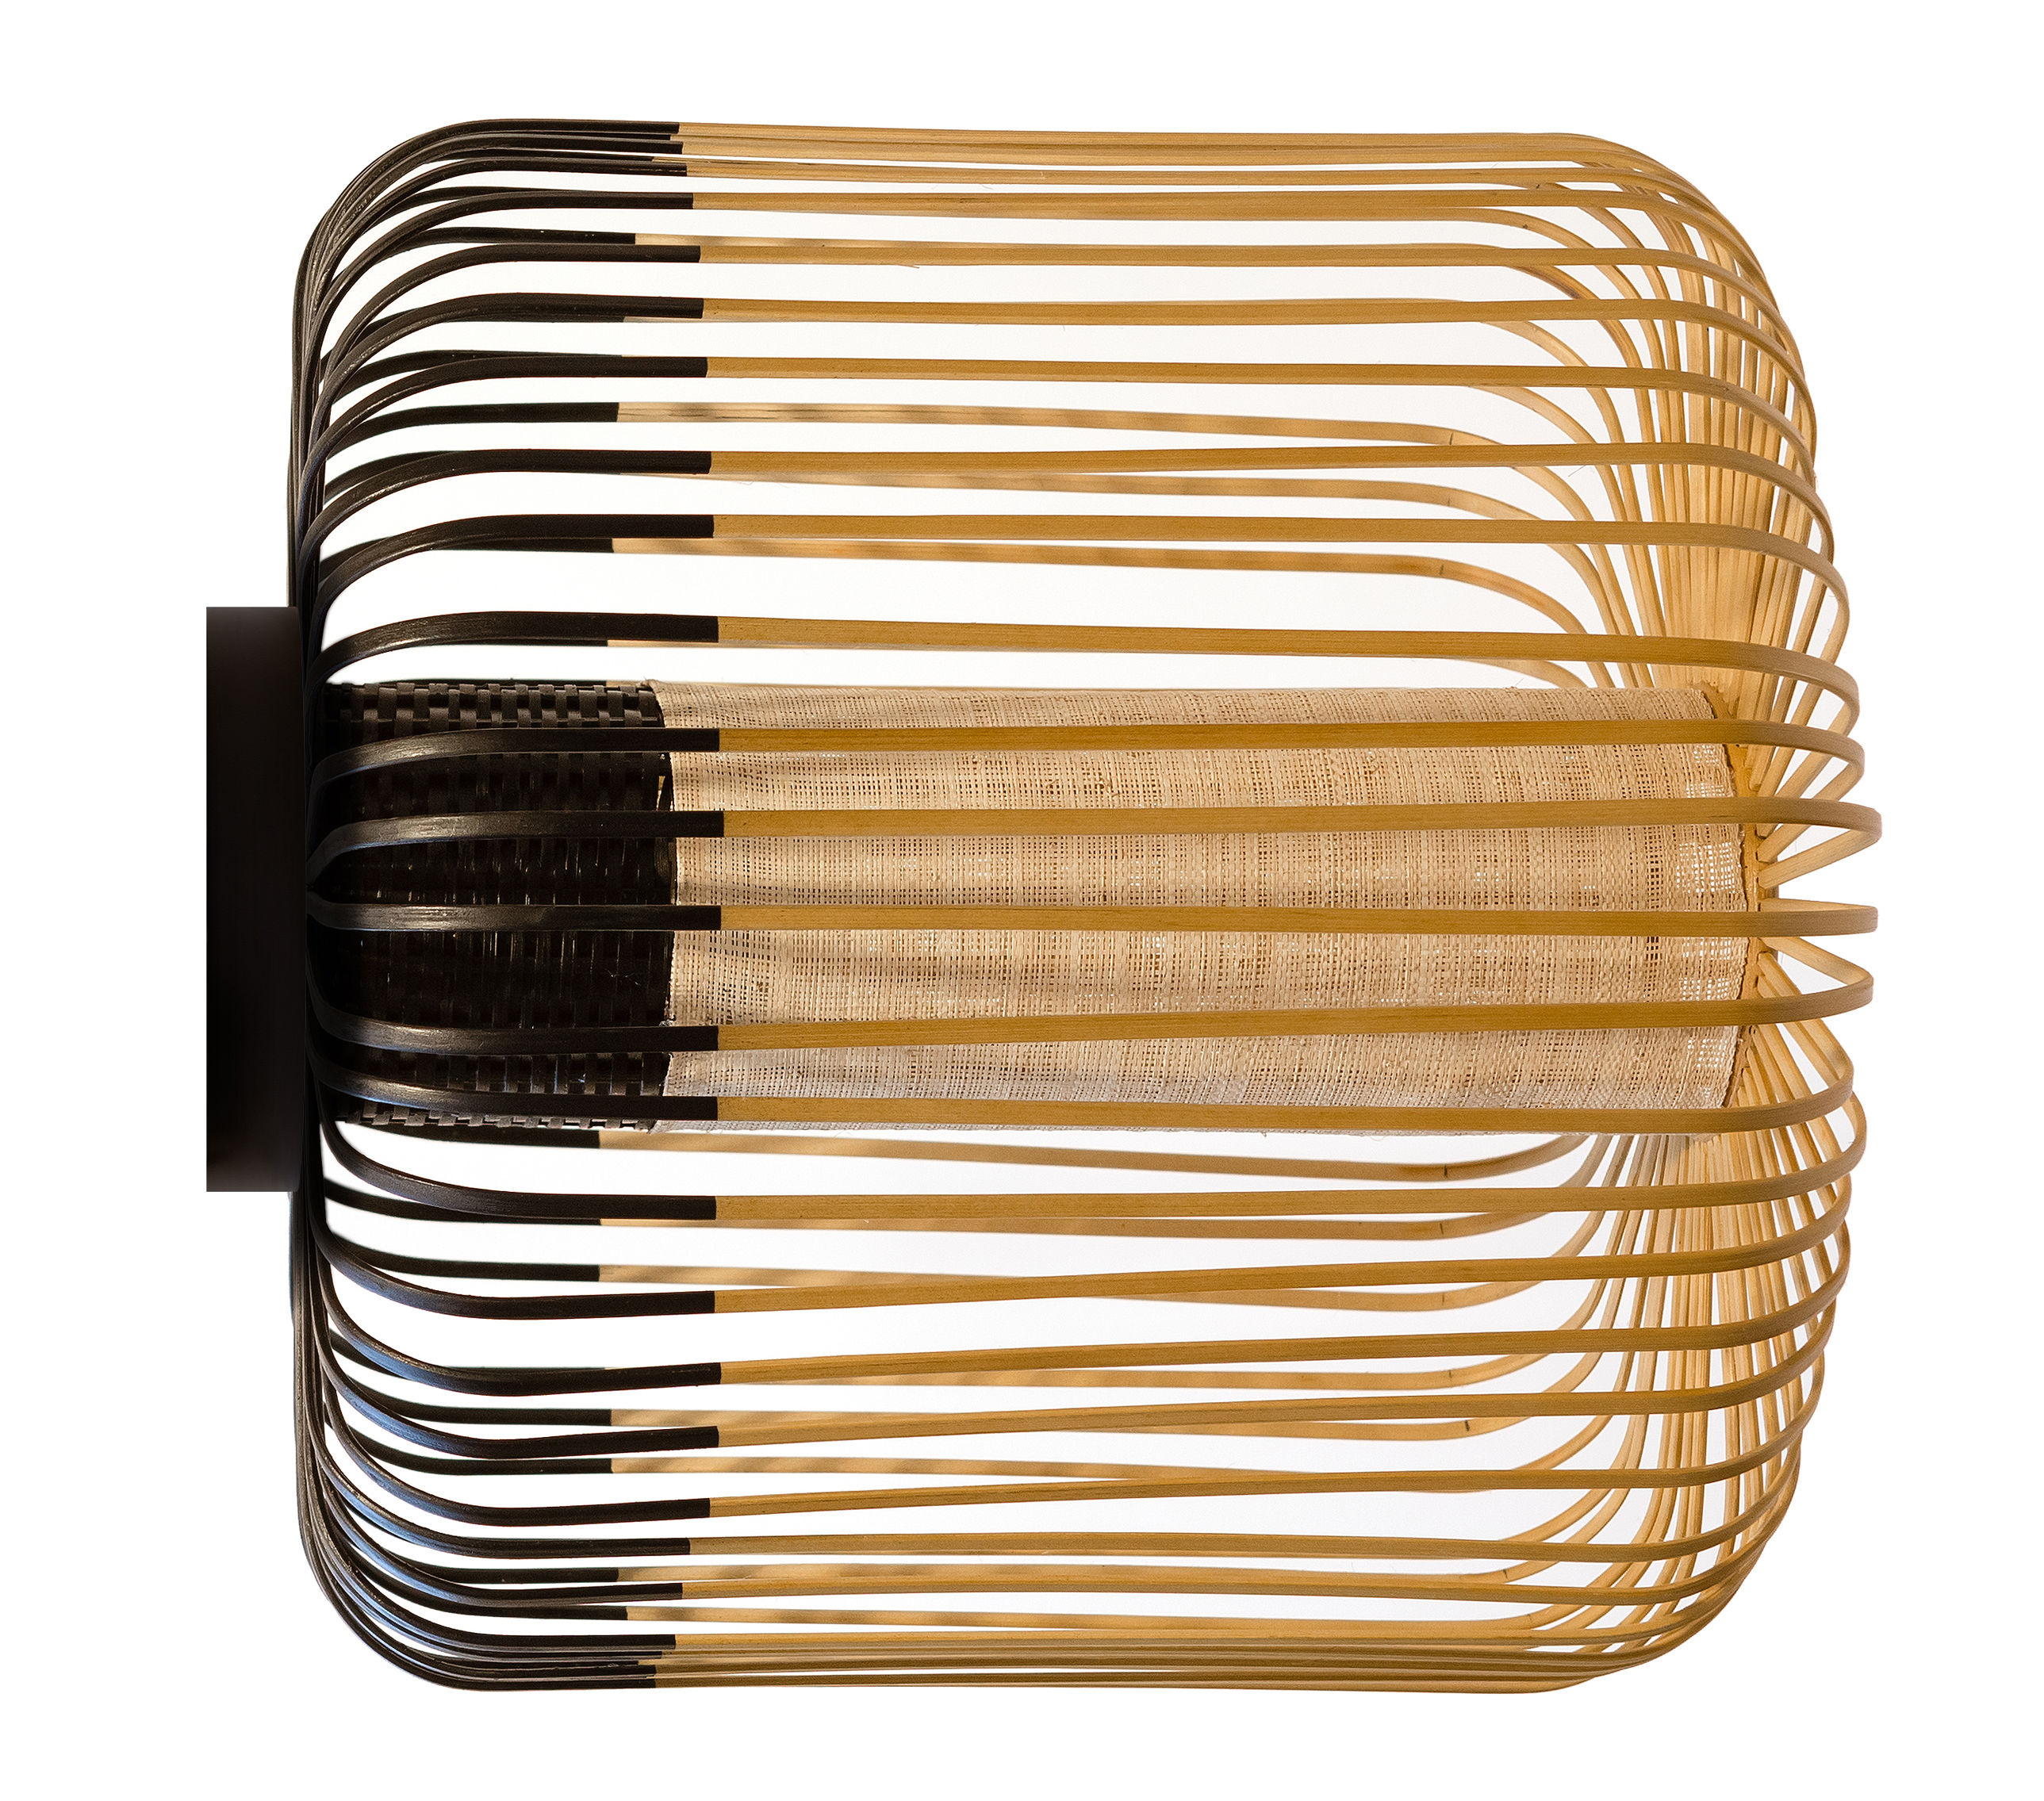 Luminaire - Appliques - Applique Bamboo light M / Plafonnier - Ø 45 x H 40 cm - Forestier - Noir / Naturel - Bambou naturel, Tissu